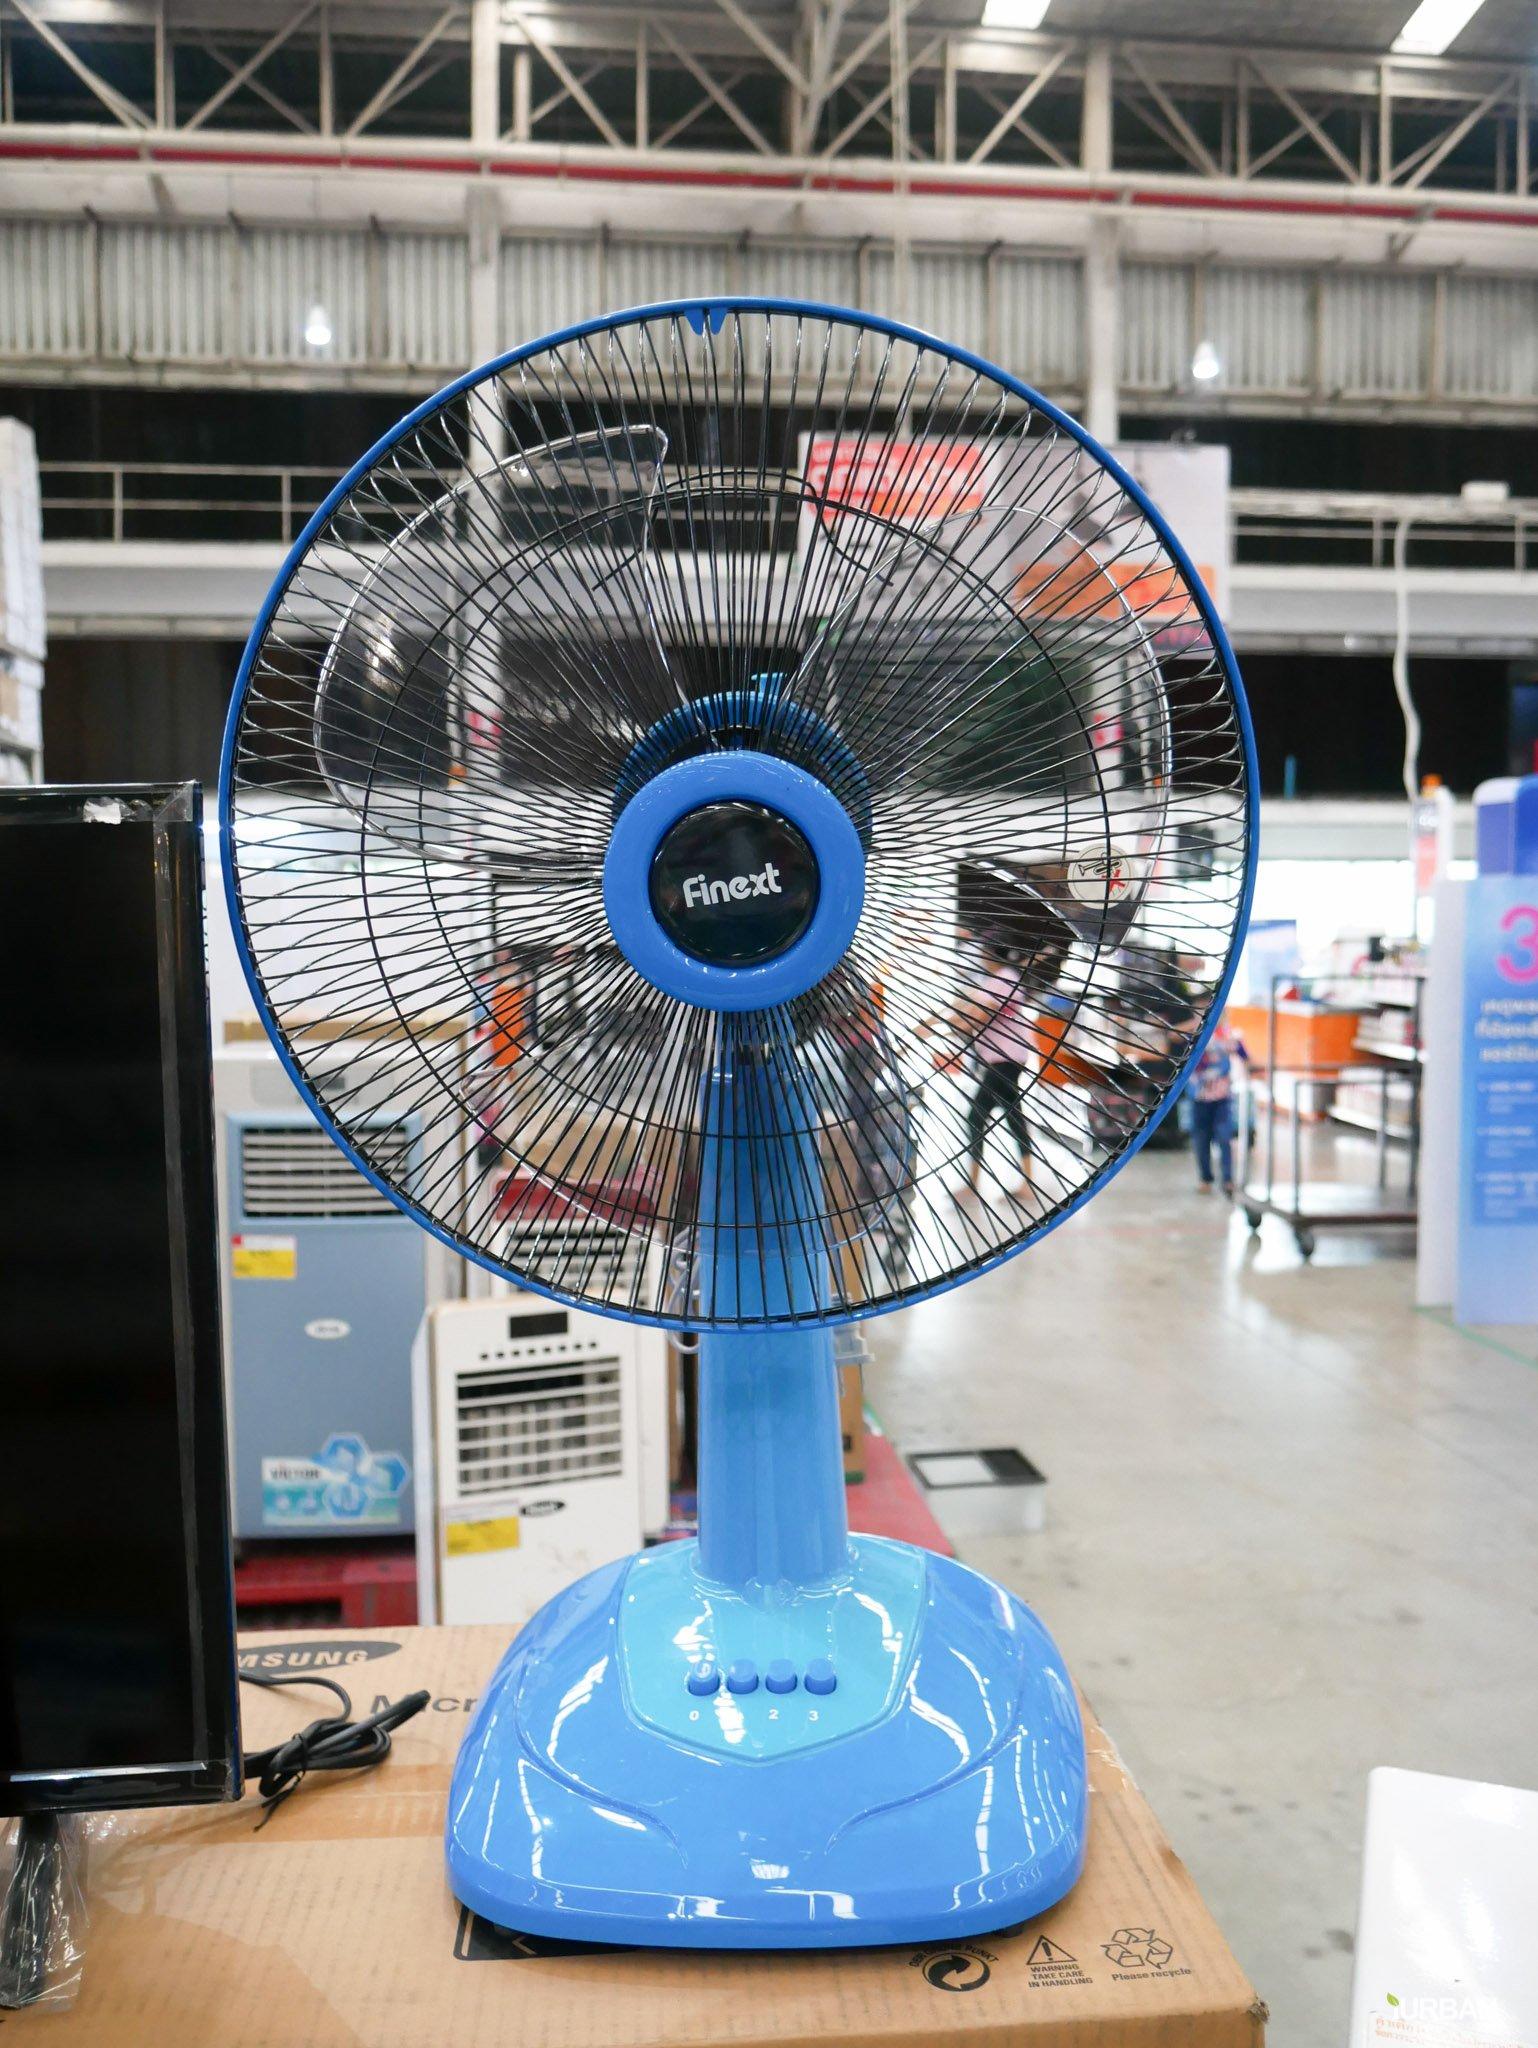 Dohome จัดโปรเครื่องใช้ไฟฟ้าคุ้ม 6 ชุด พร้อมคลิปพาเดินเที่ยวสาขาดูโฮม รังสิต 32 - Dohome (ดูโฮม ในเครือบริษัท อุบลวัสดุ จำกัด)